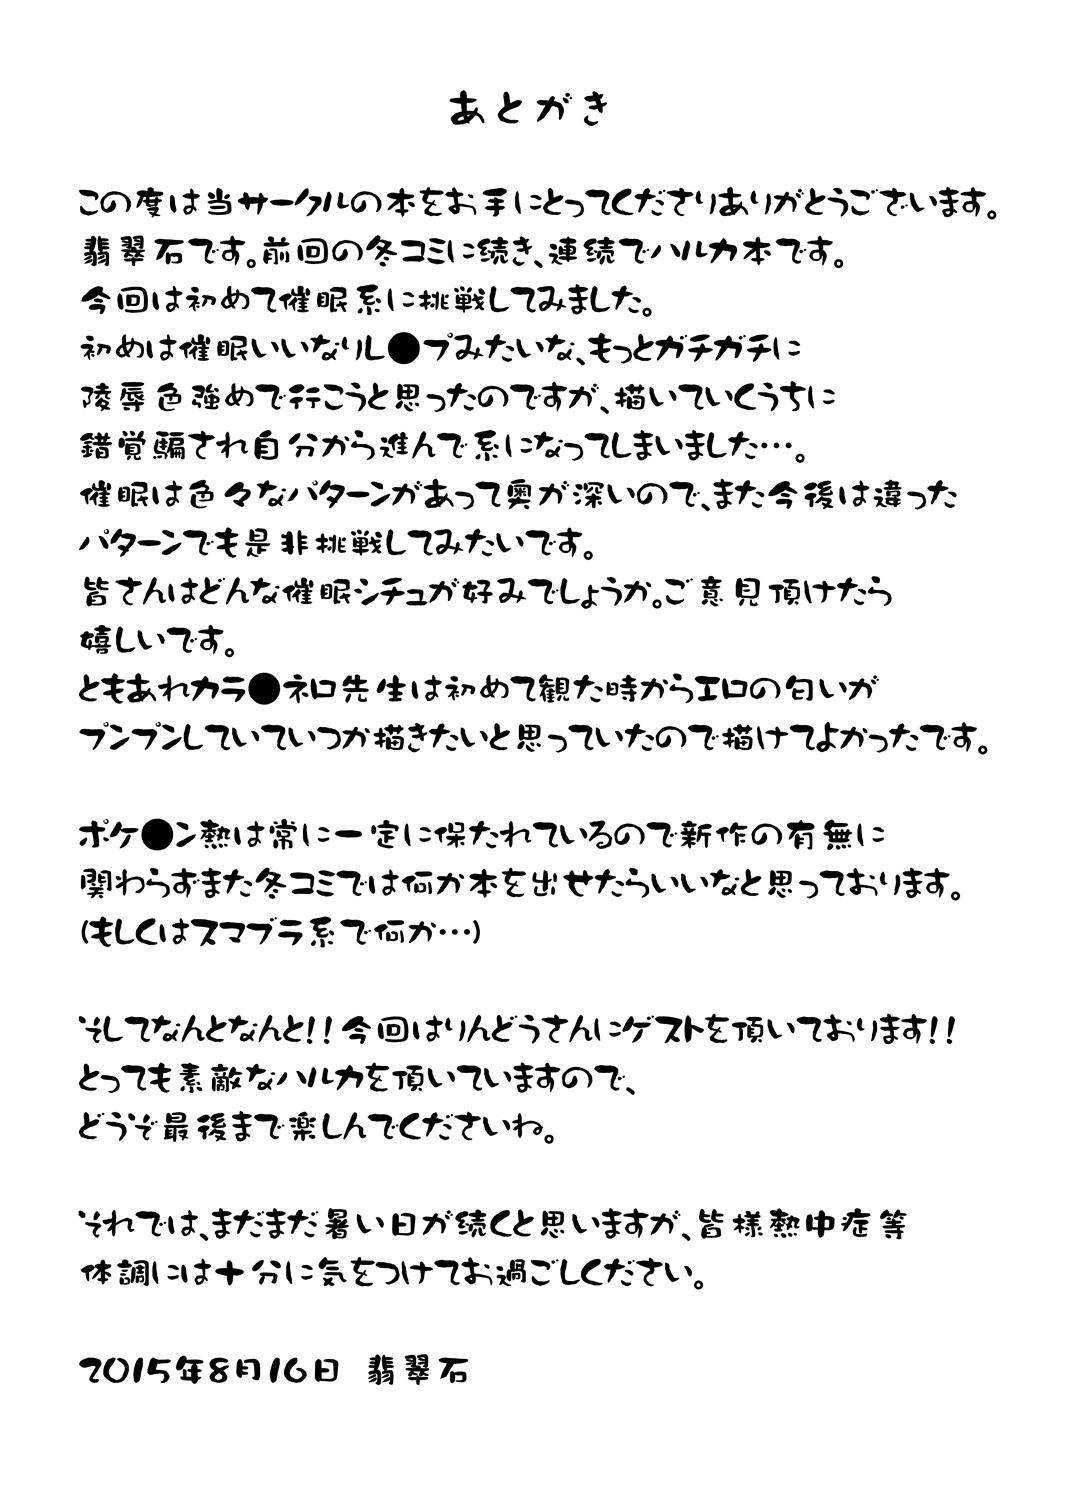 Pokemon Trainer Haruka Kyousei Saimin Battle 20